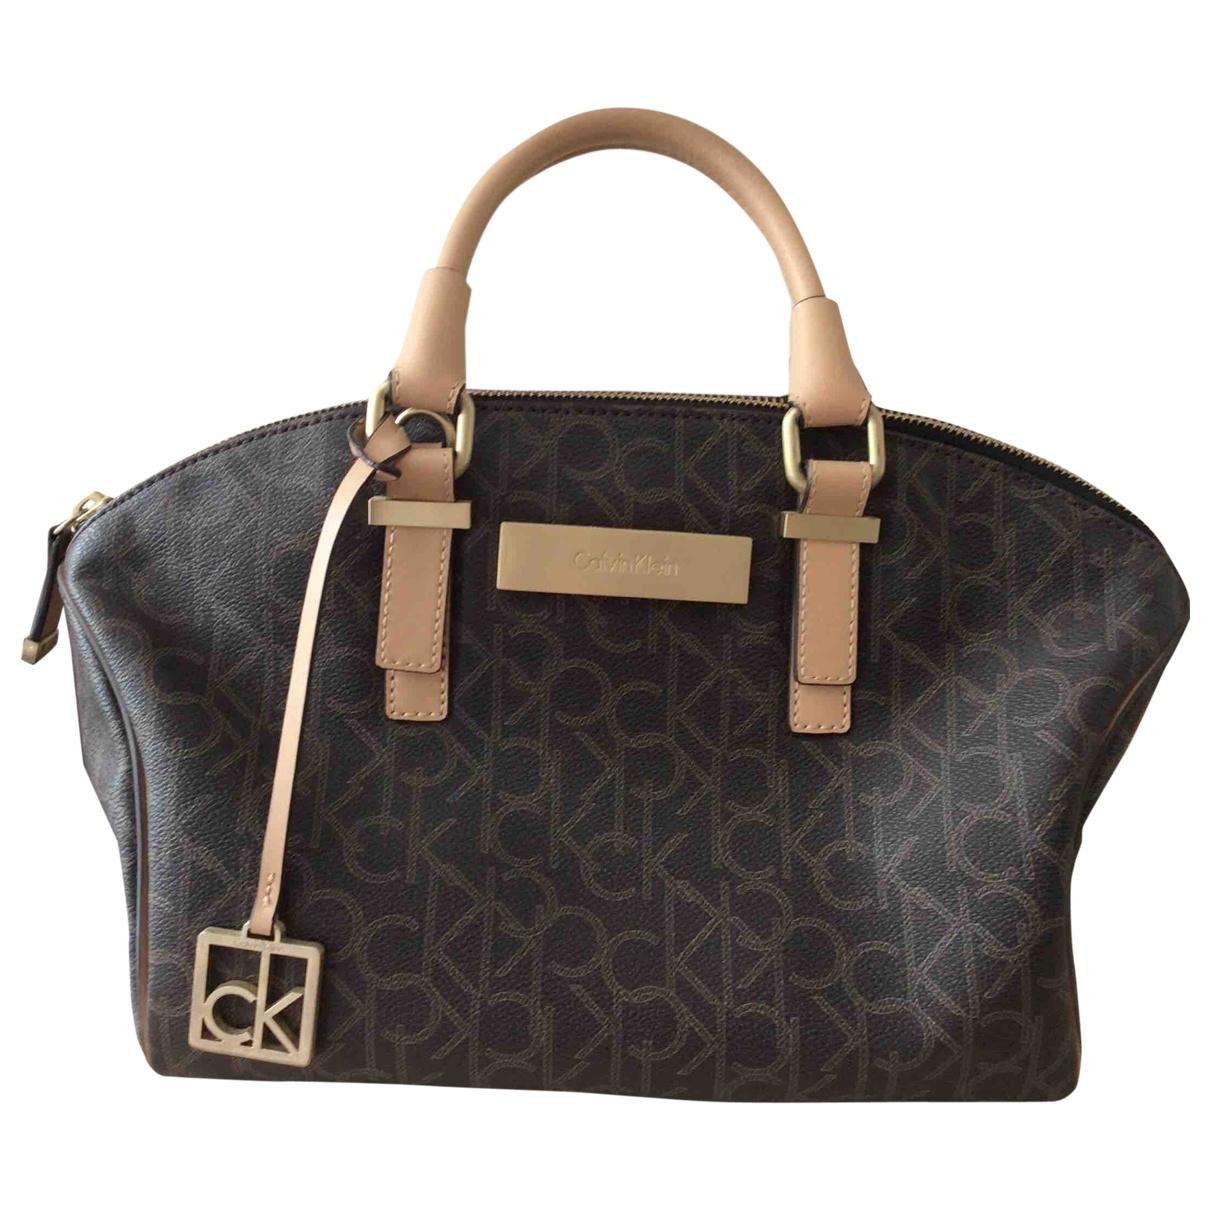 Calvin Klein \N Brown Leather handbag for Women \N